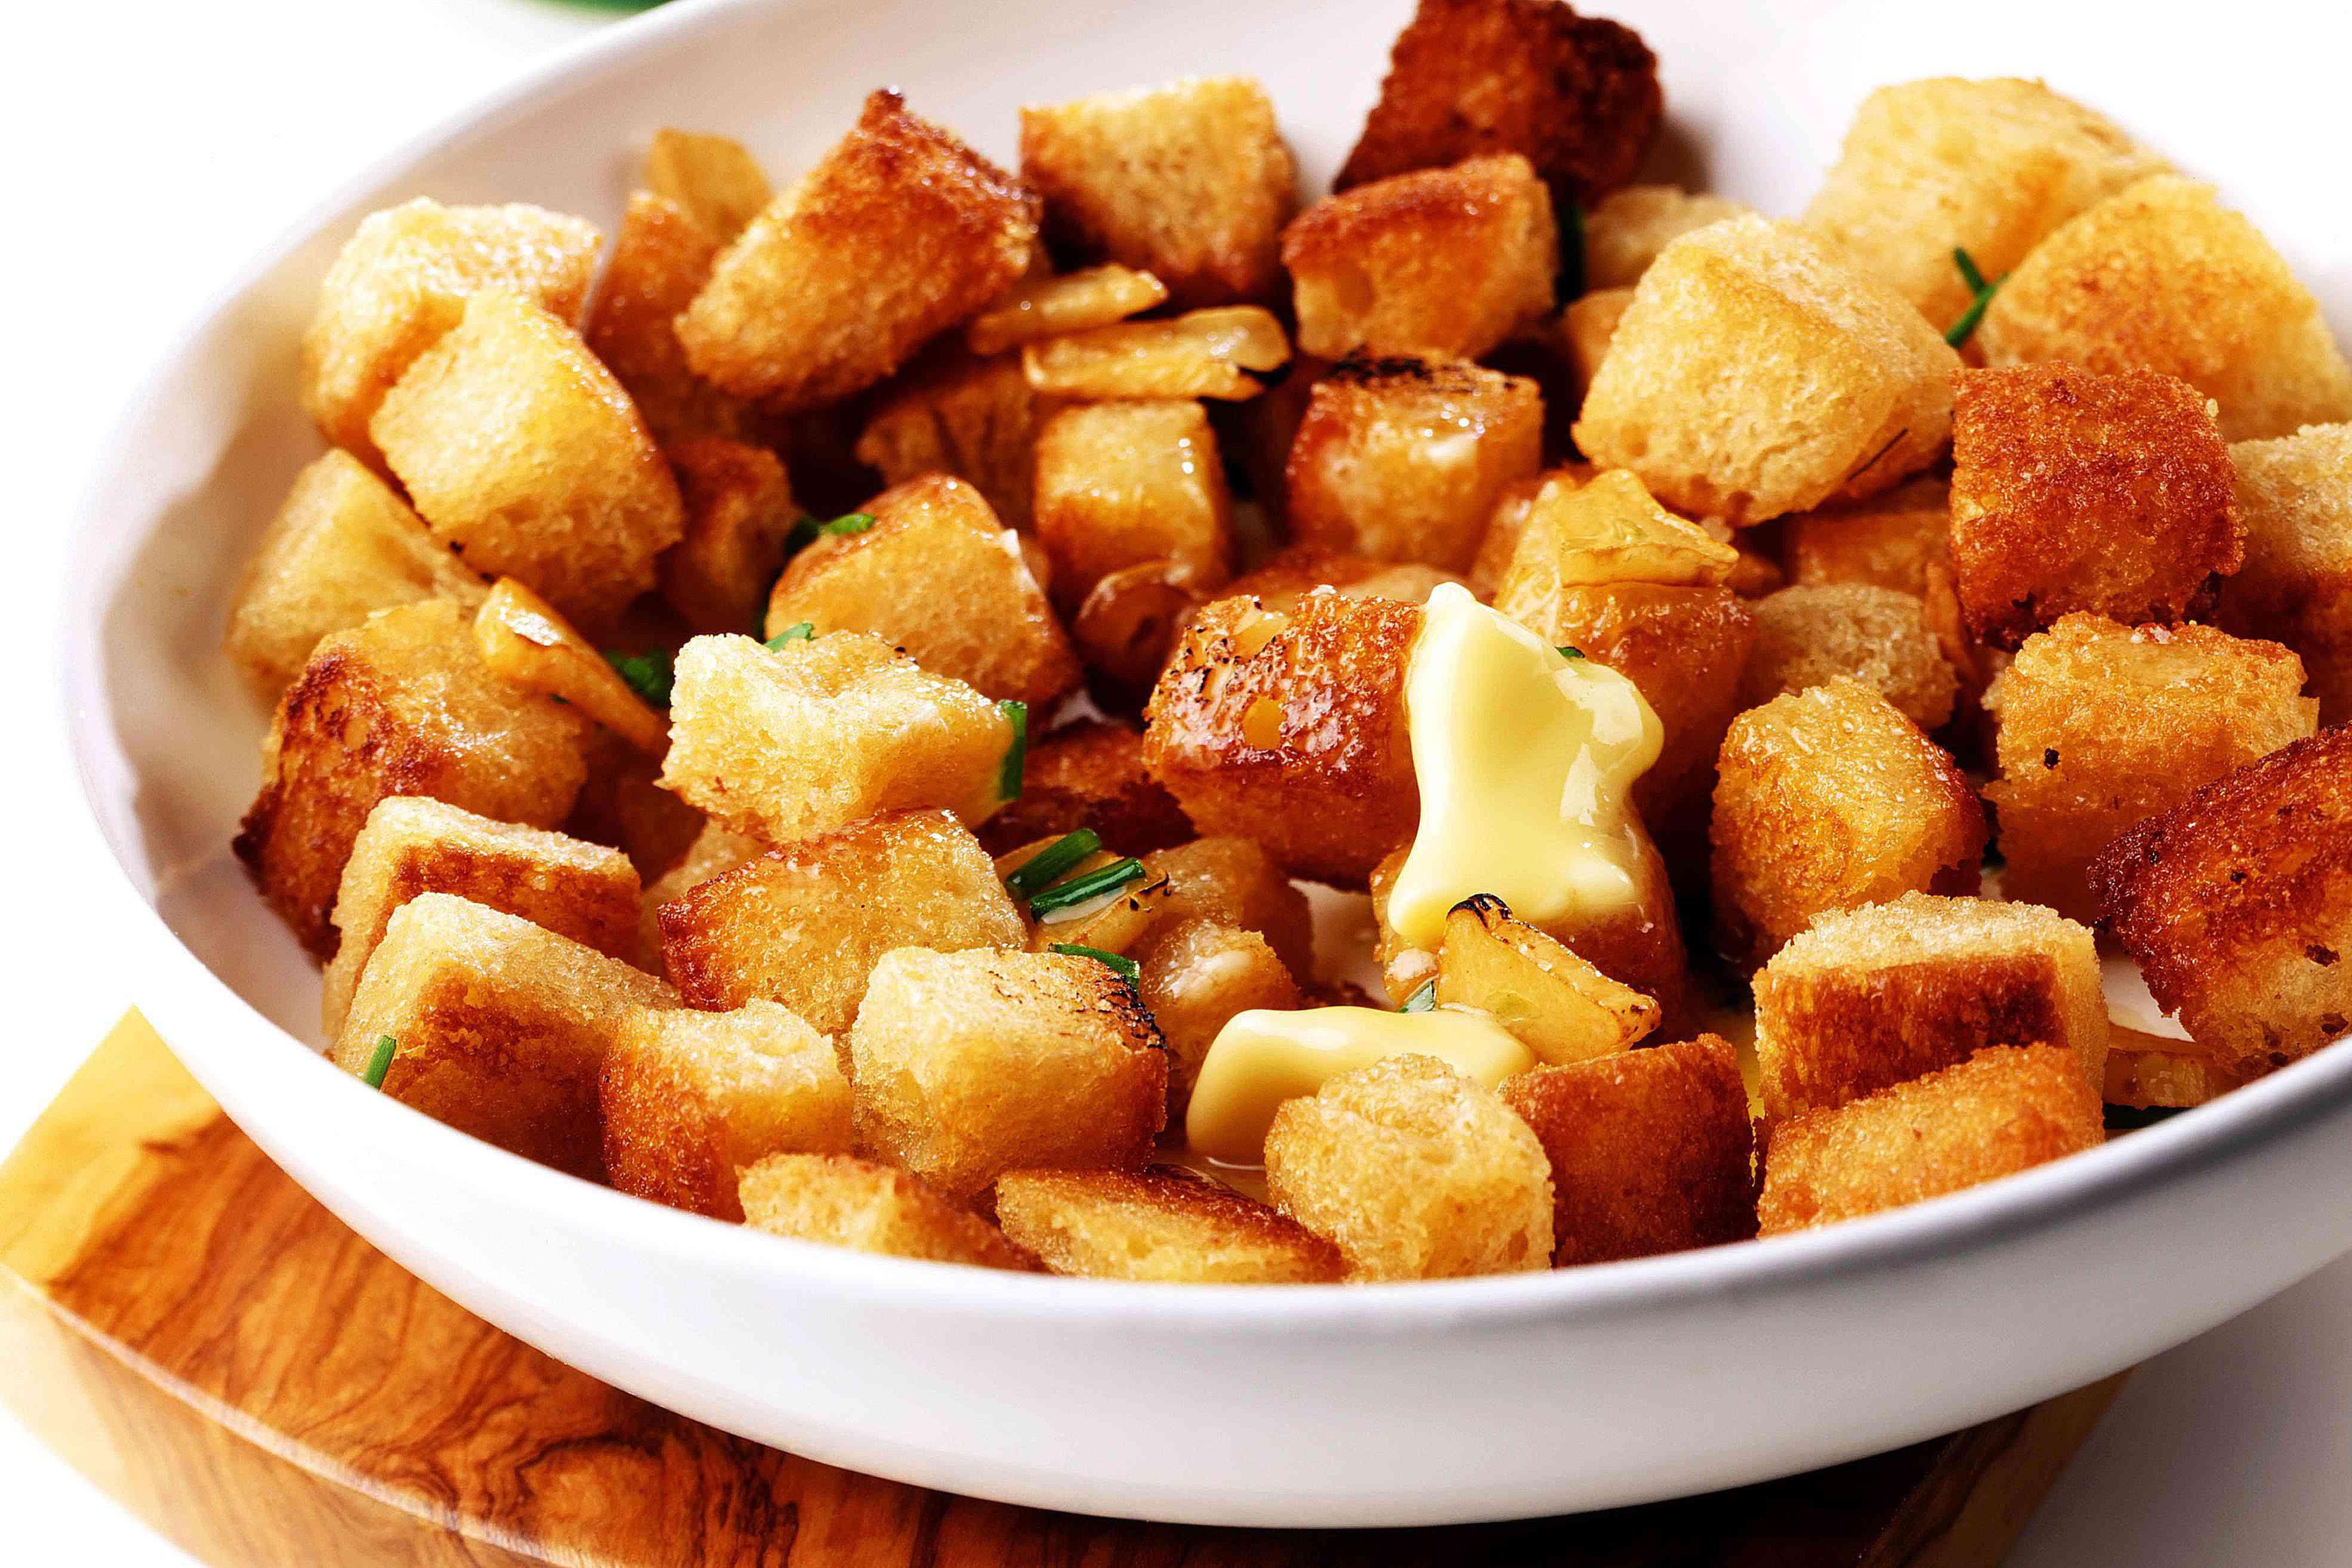 Crispy garlic croutons